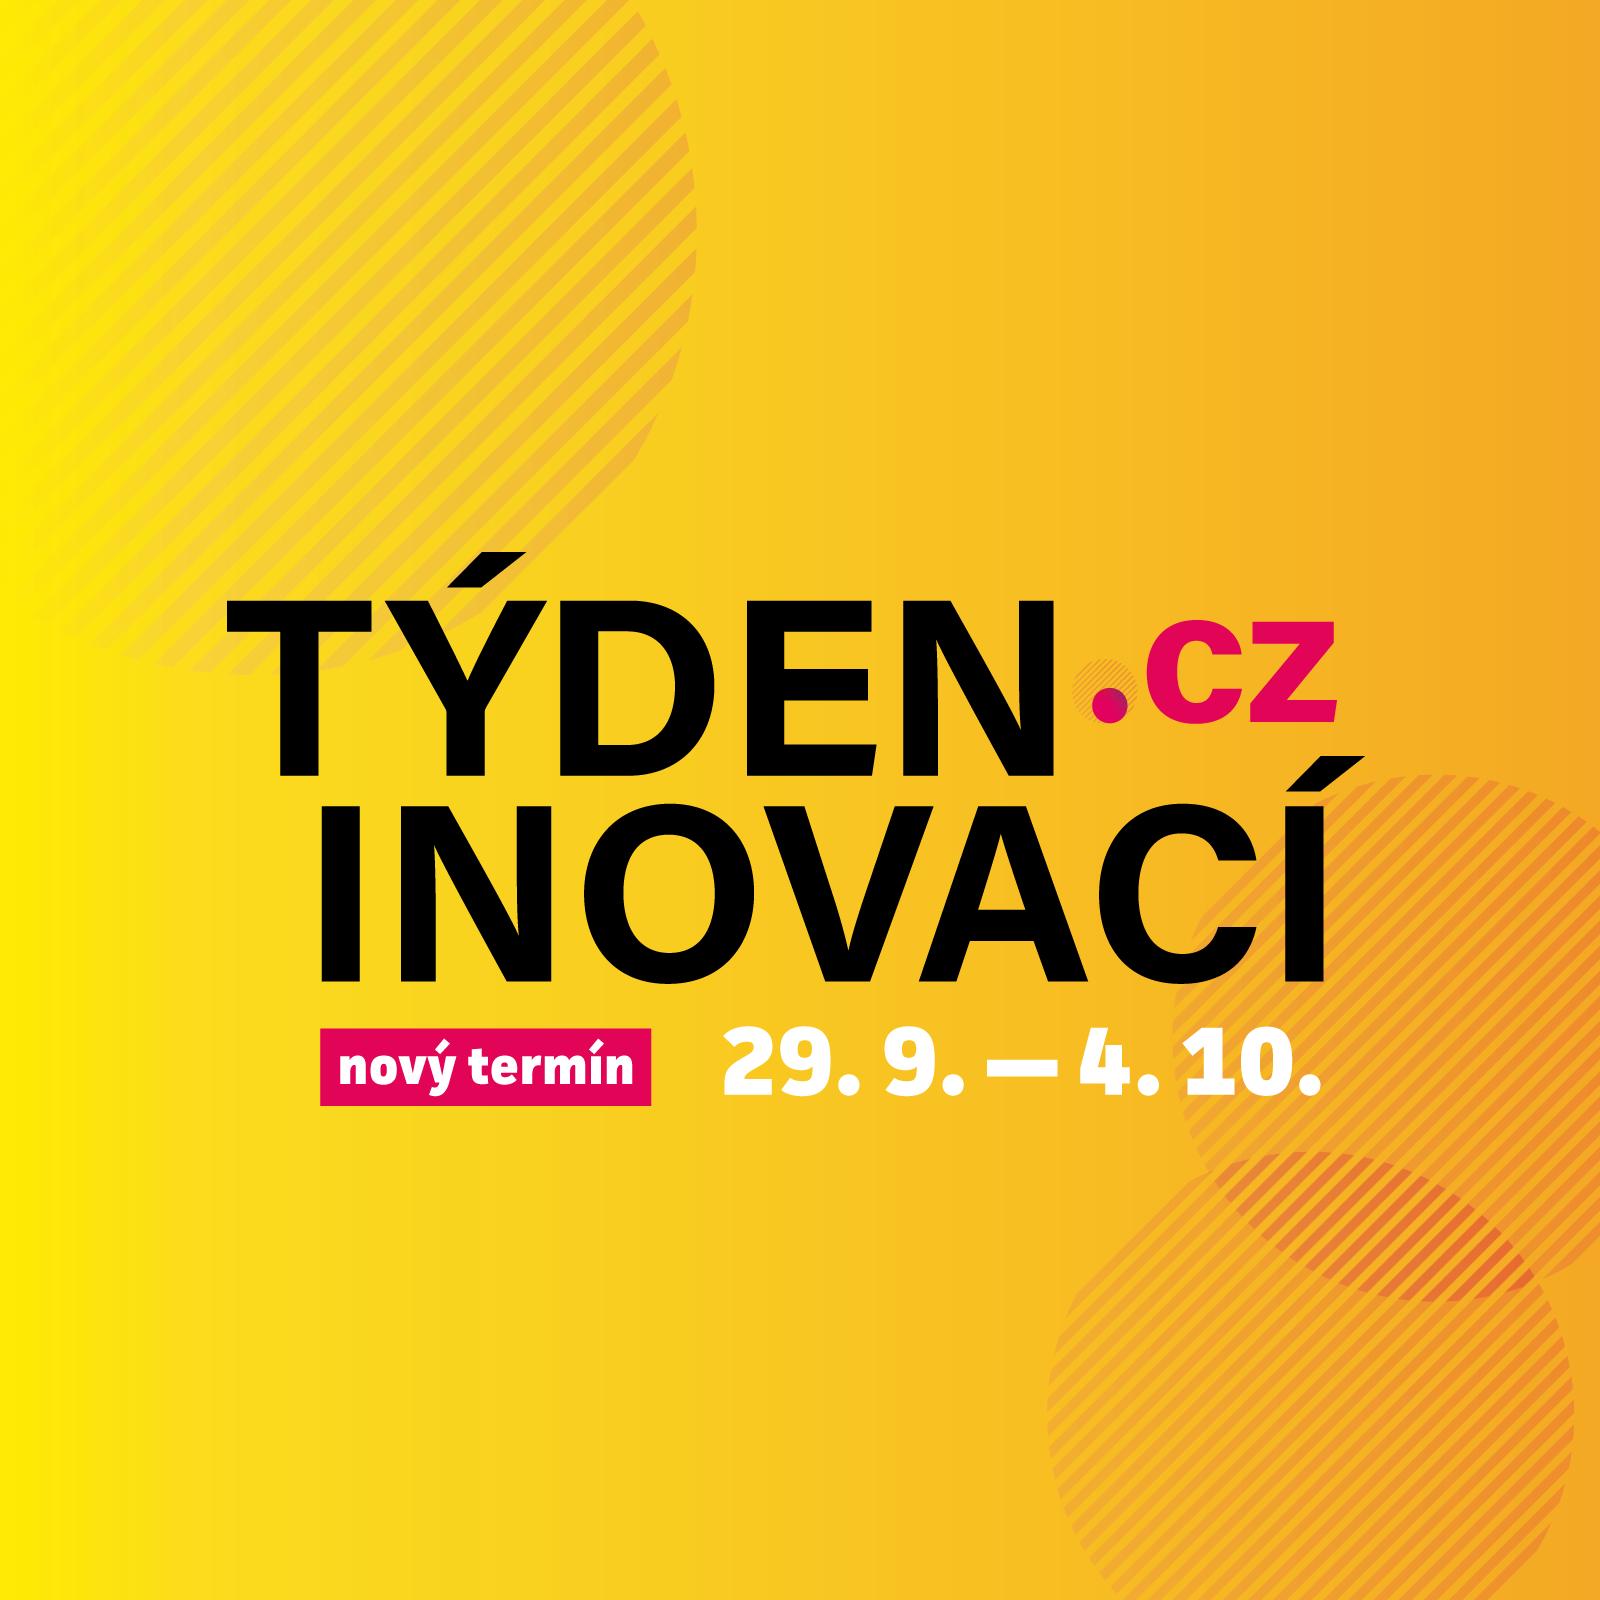 tyden_inovaci_logo